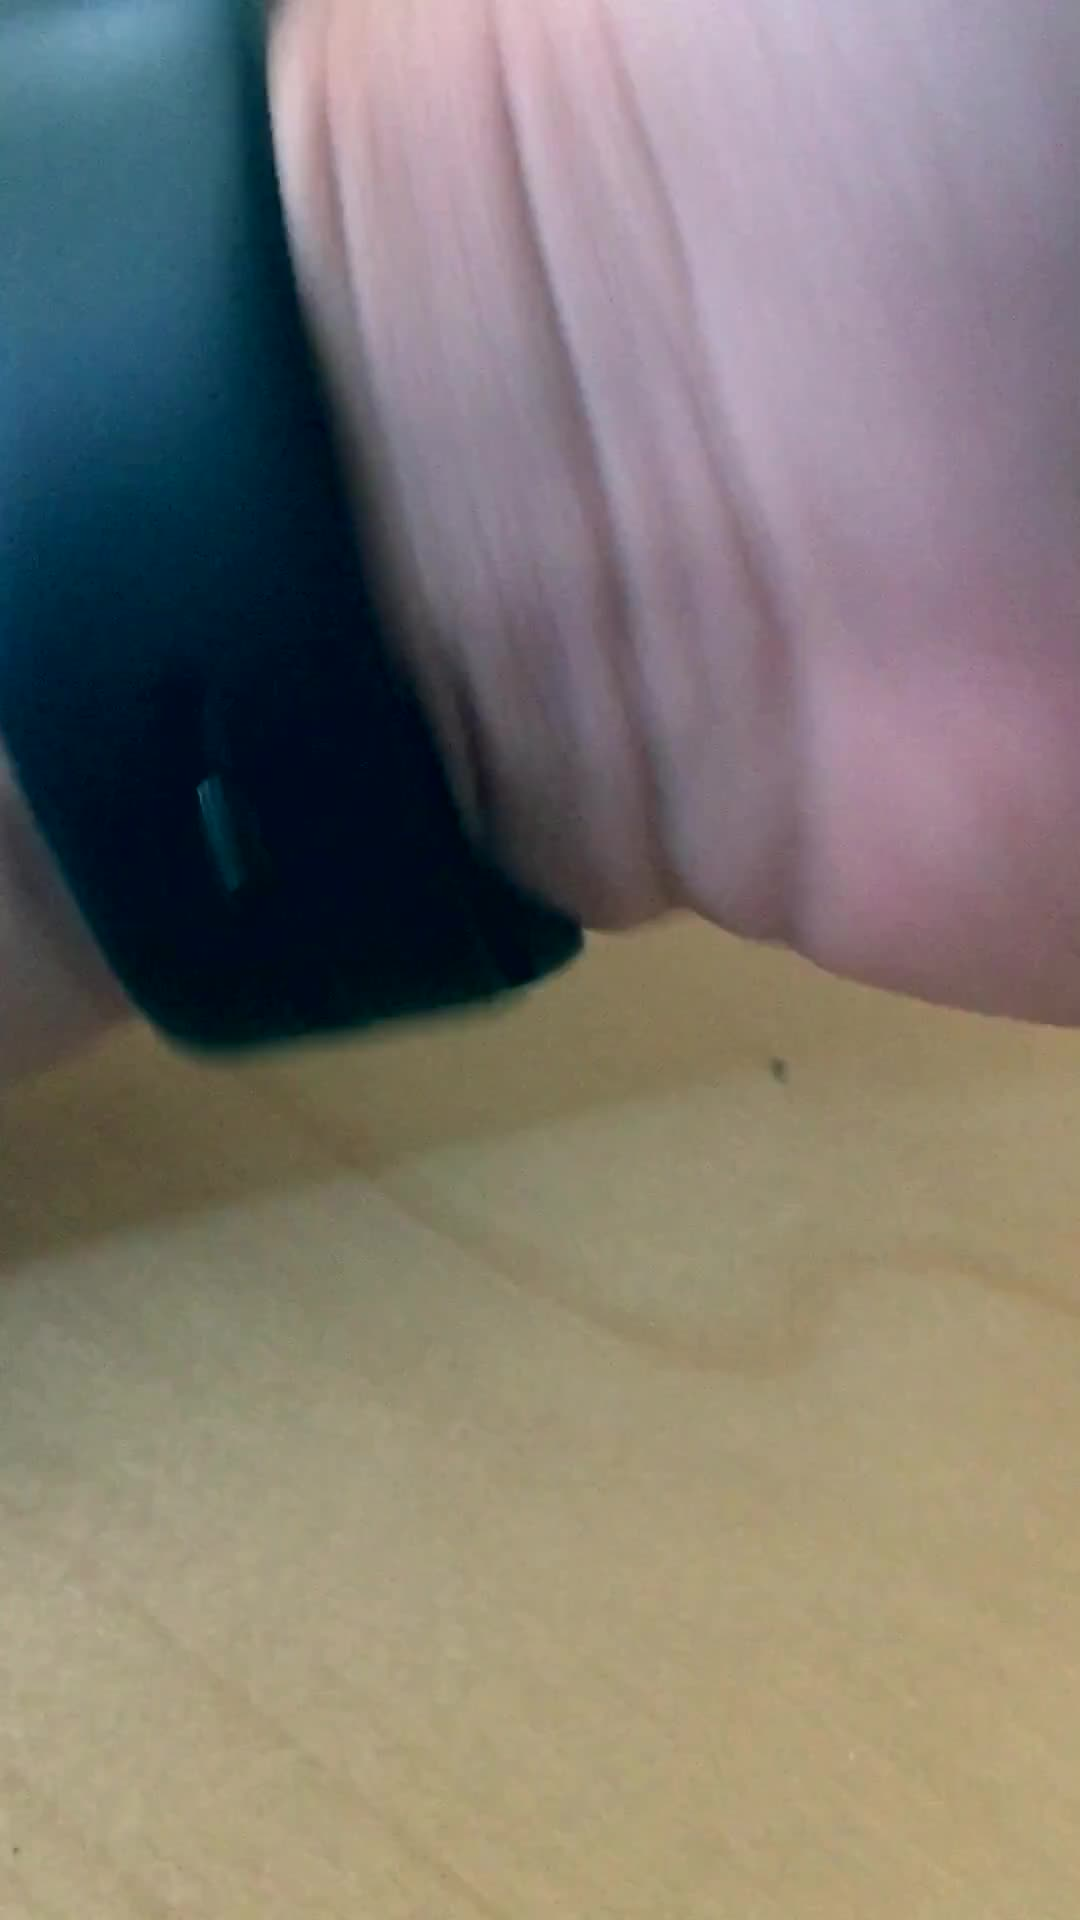 applewatch, smartwatchwatch, Glimpse for Apple Watch GIFs